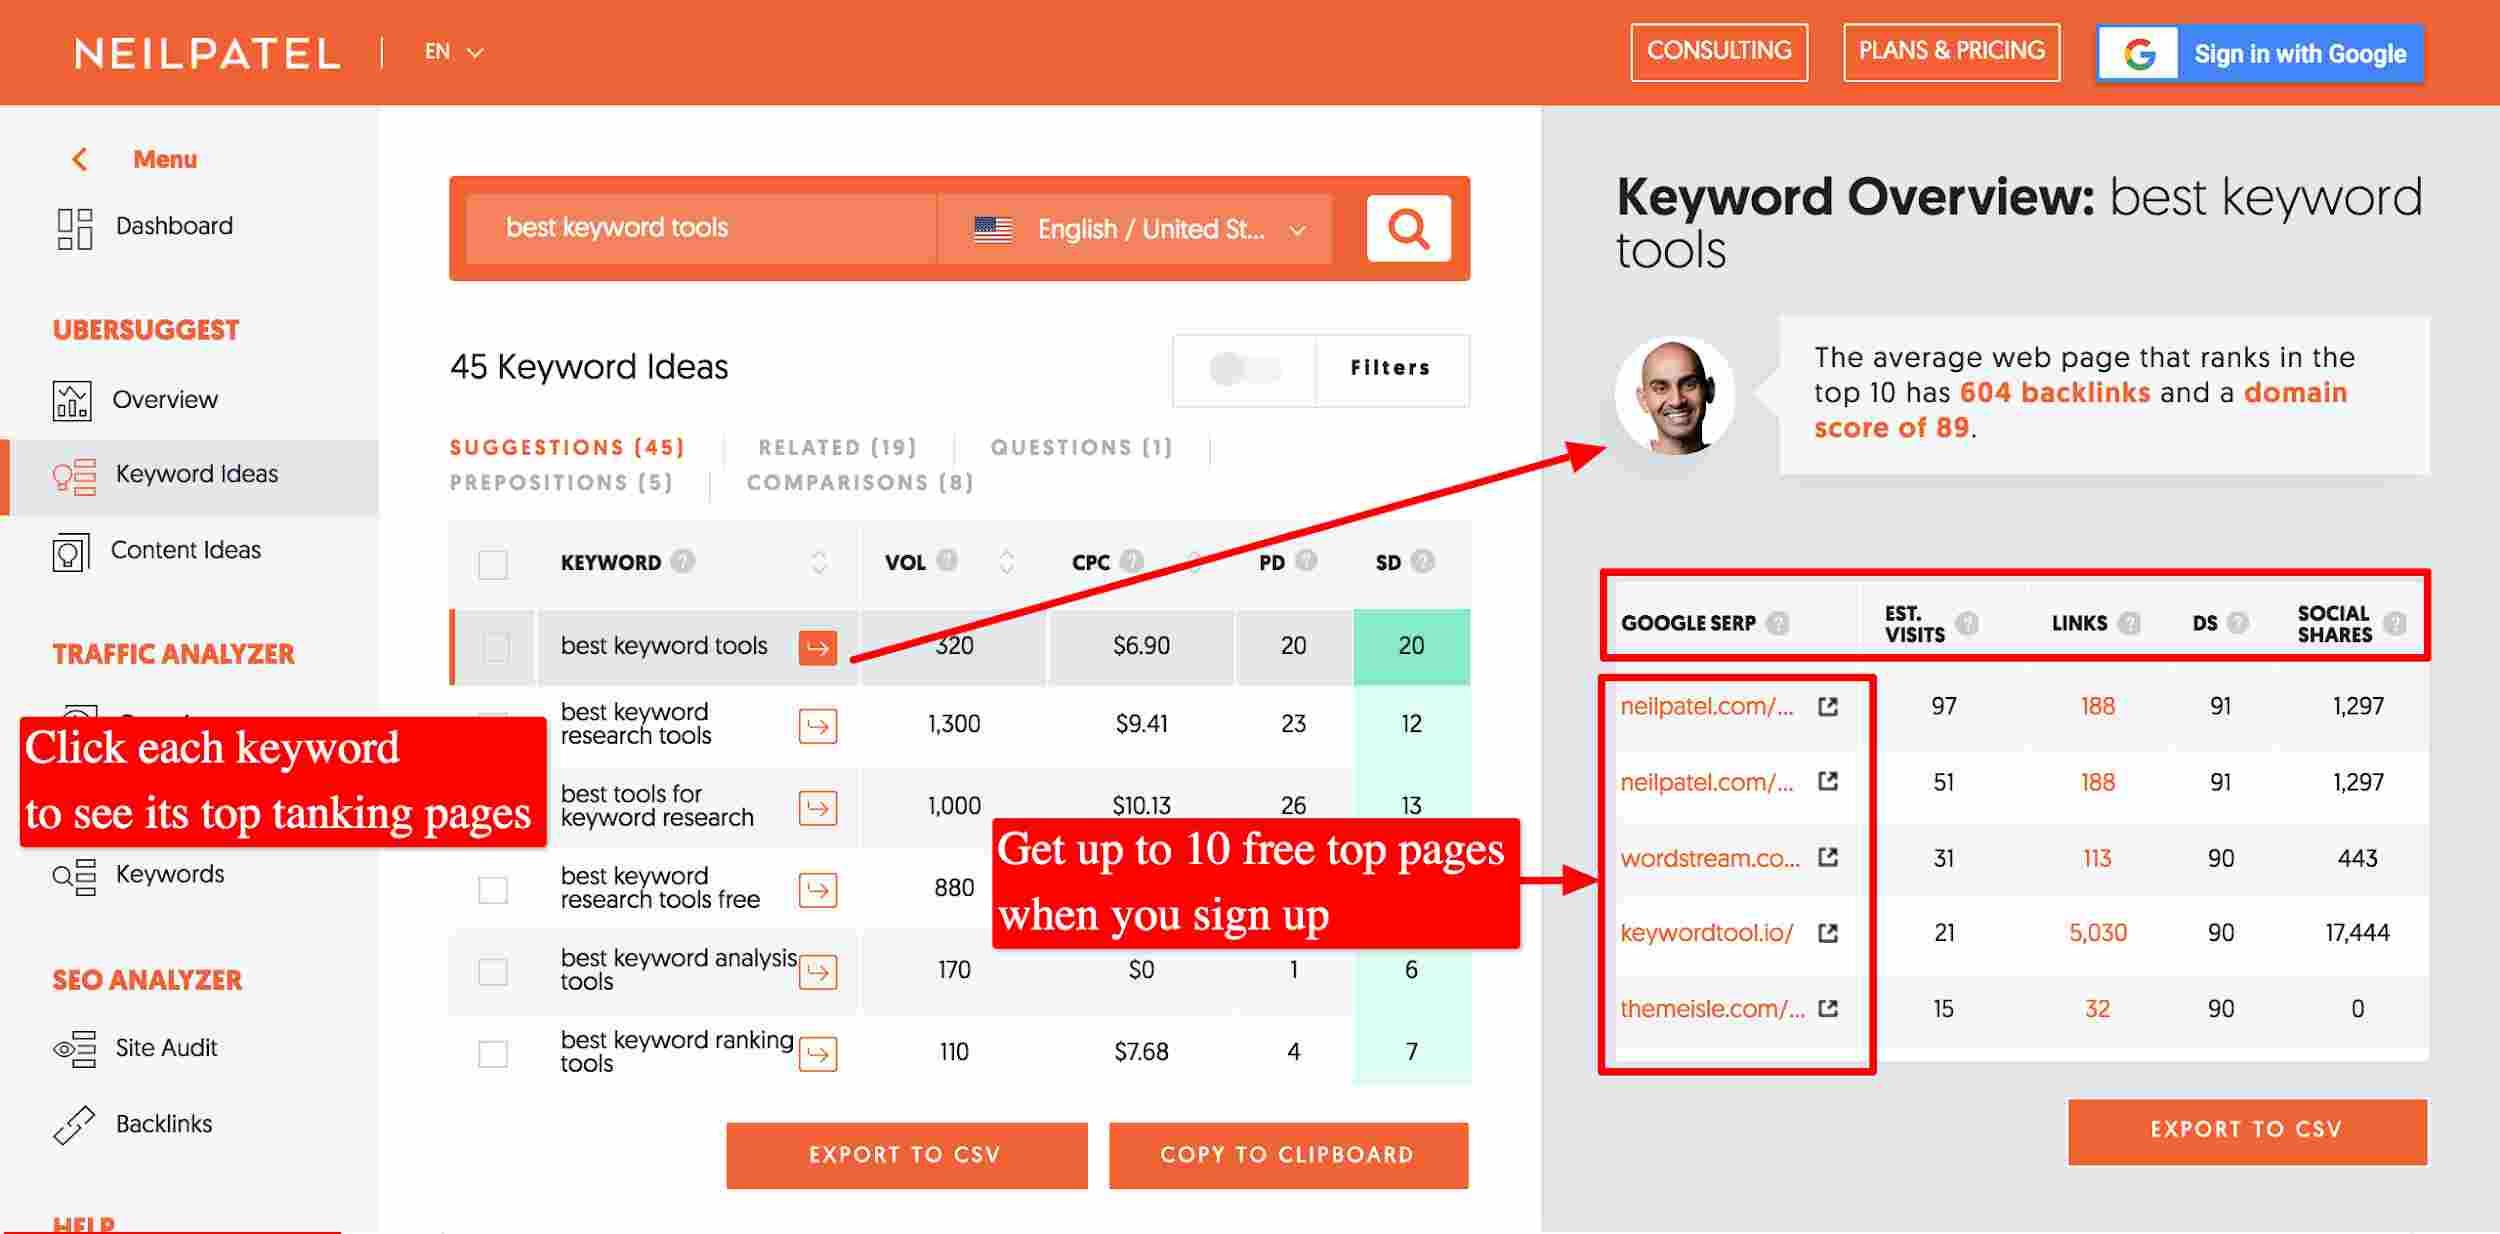 Ubersuggest Keyword overview best keyword tools